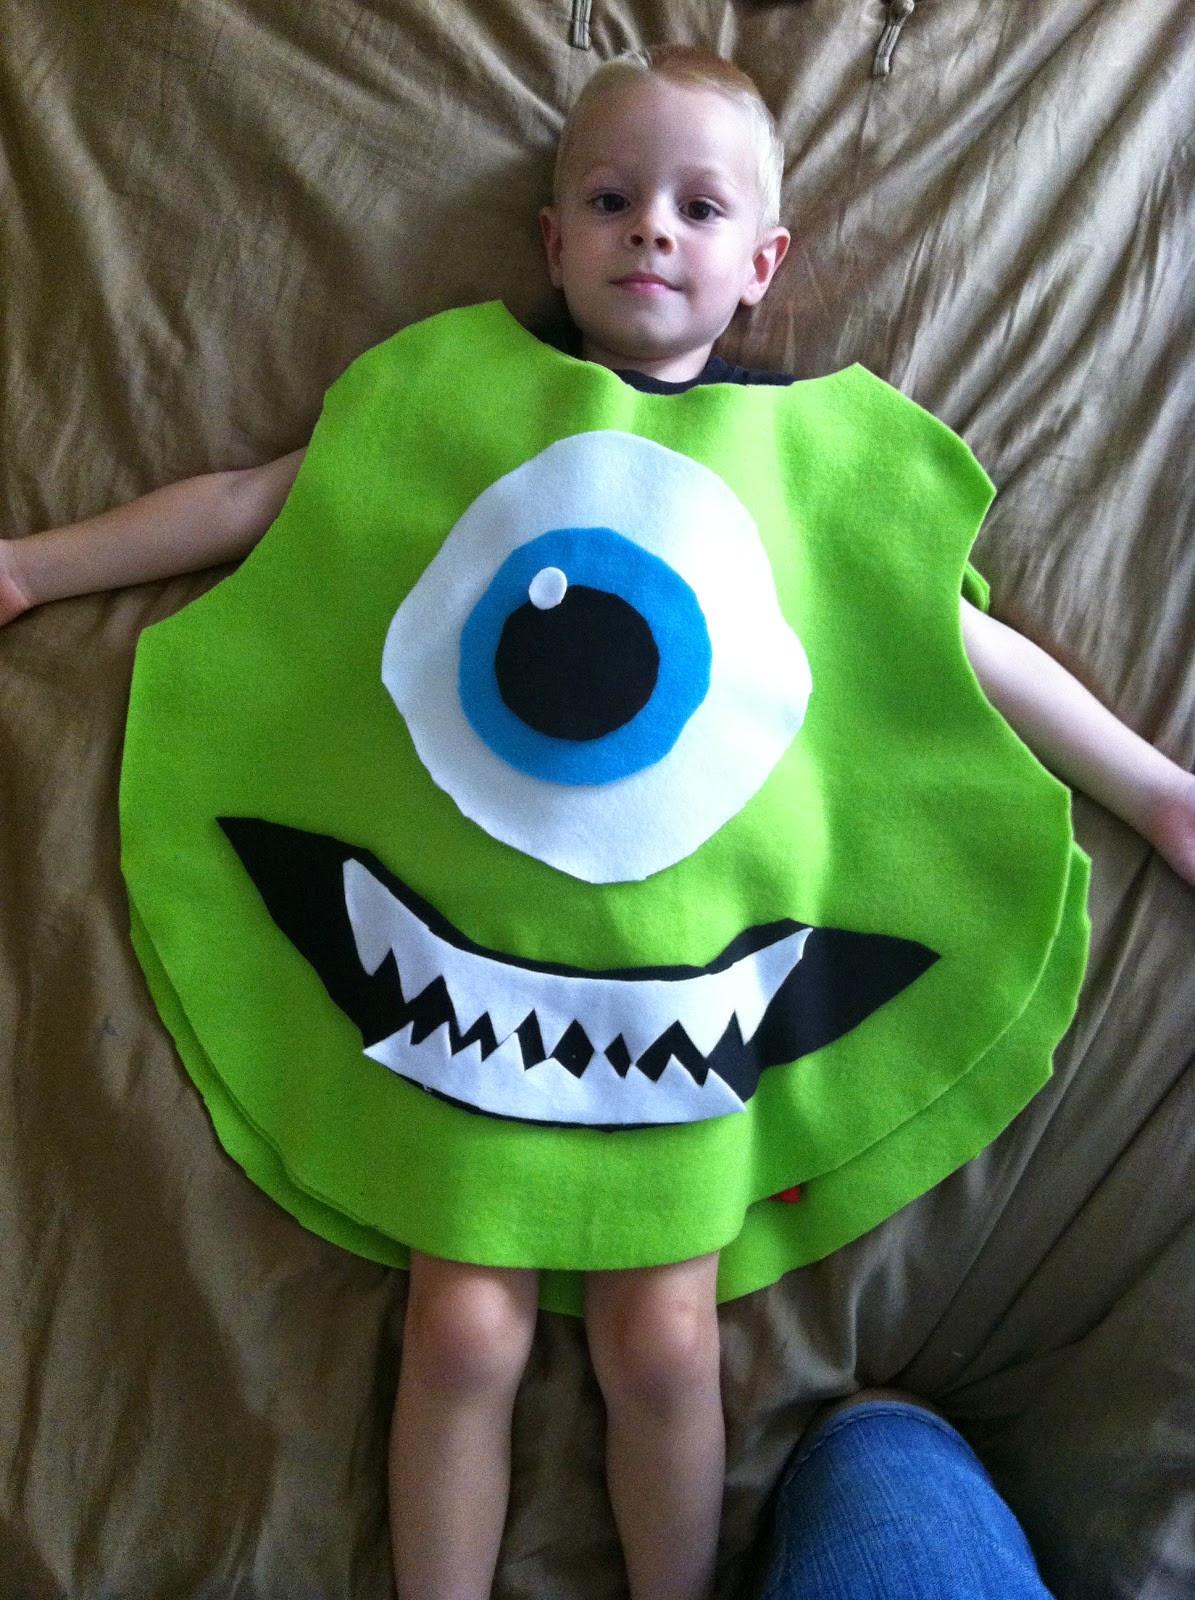 DIY Monster Inc Costume  Chadwicks Picture Place Homemade Mike Wazowski Halloween